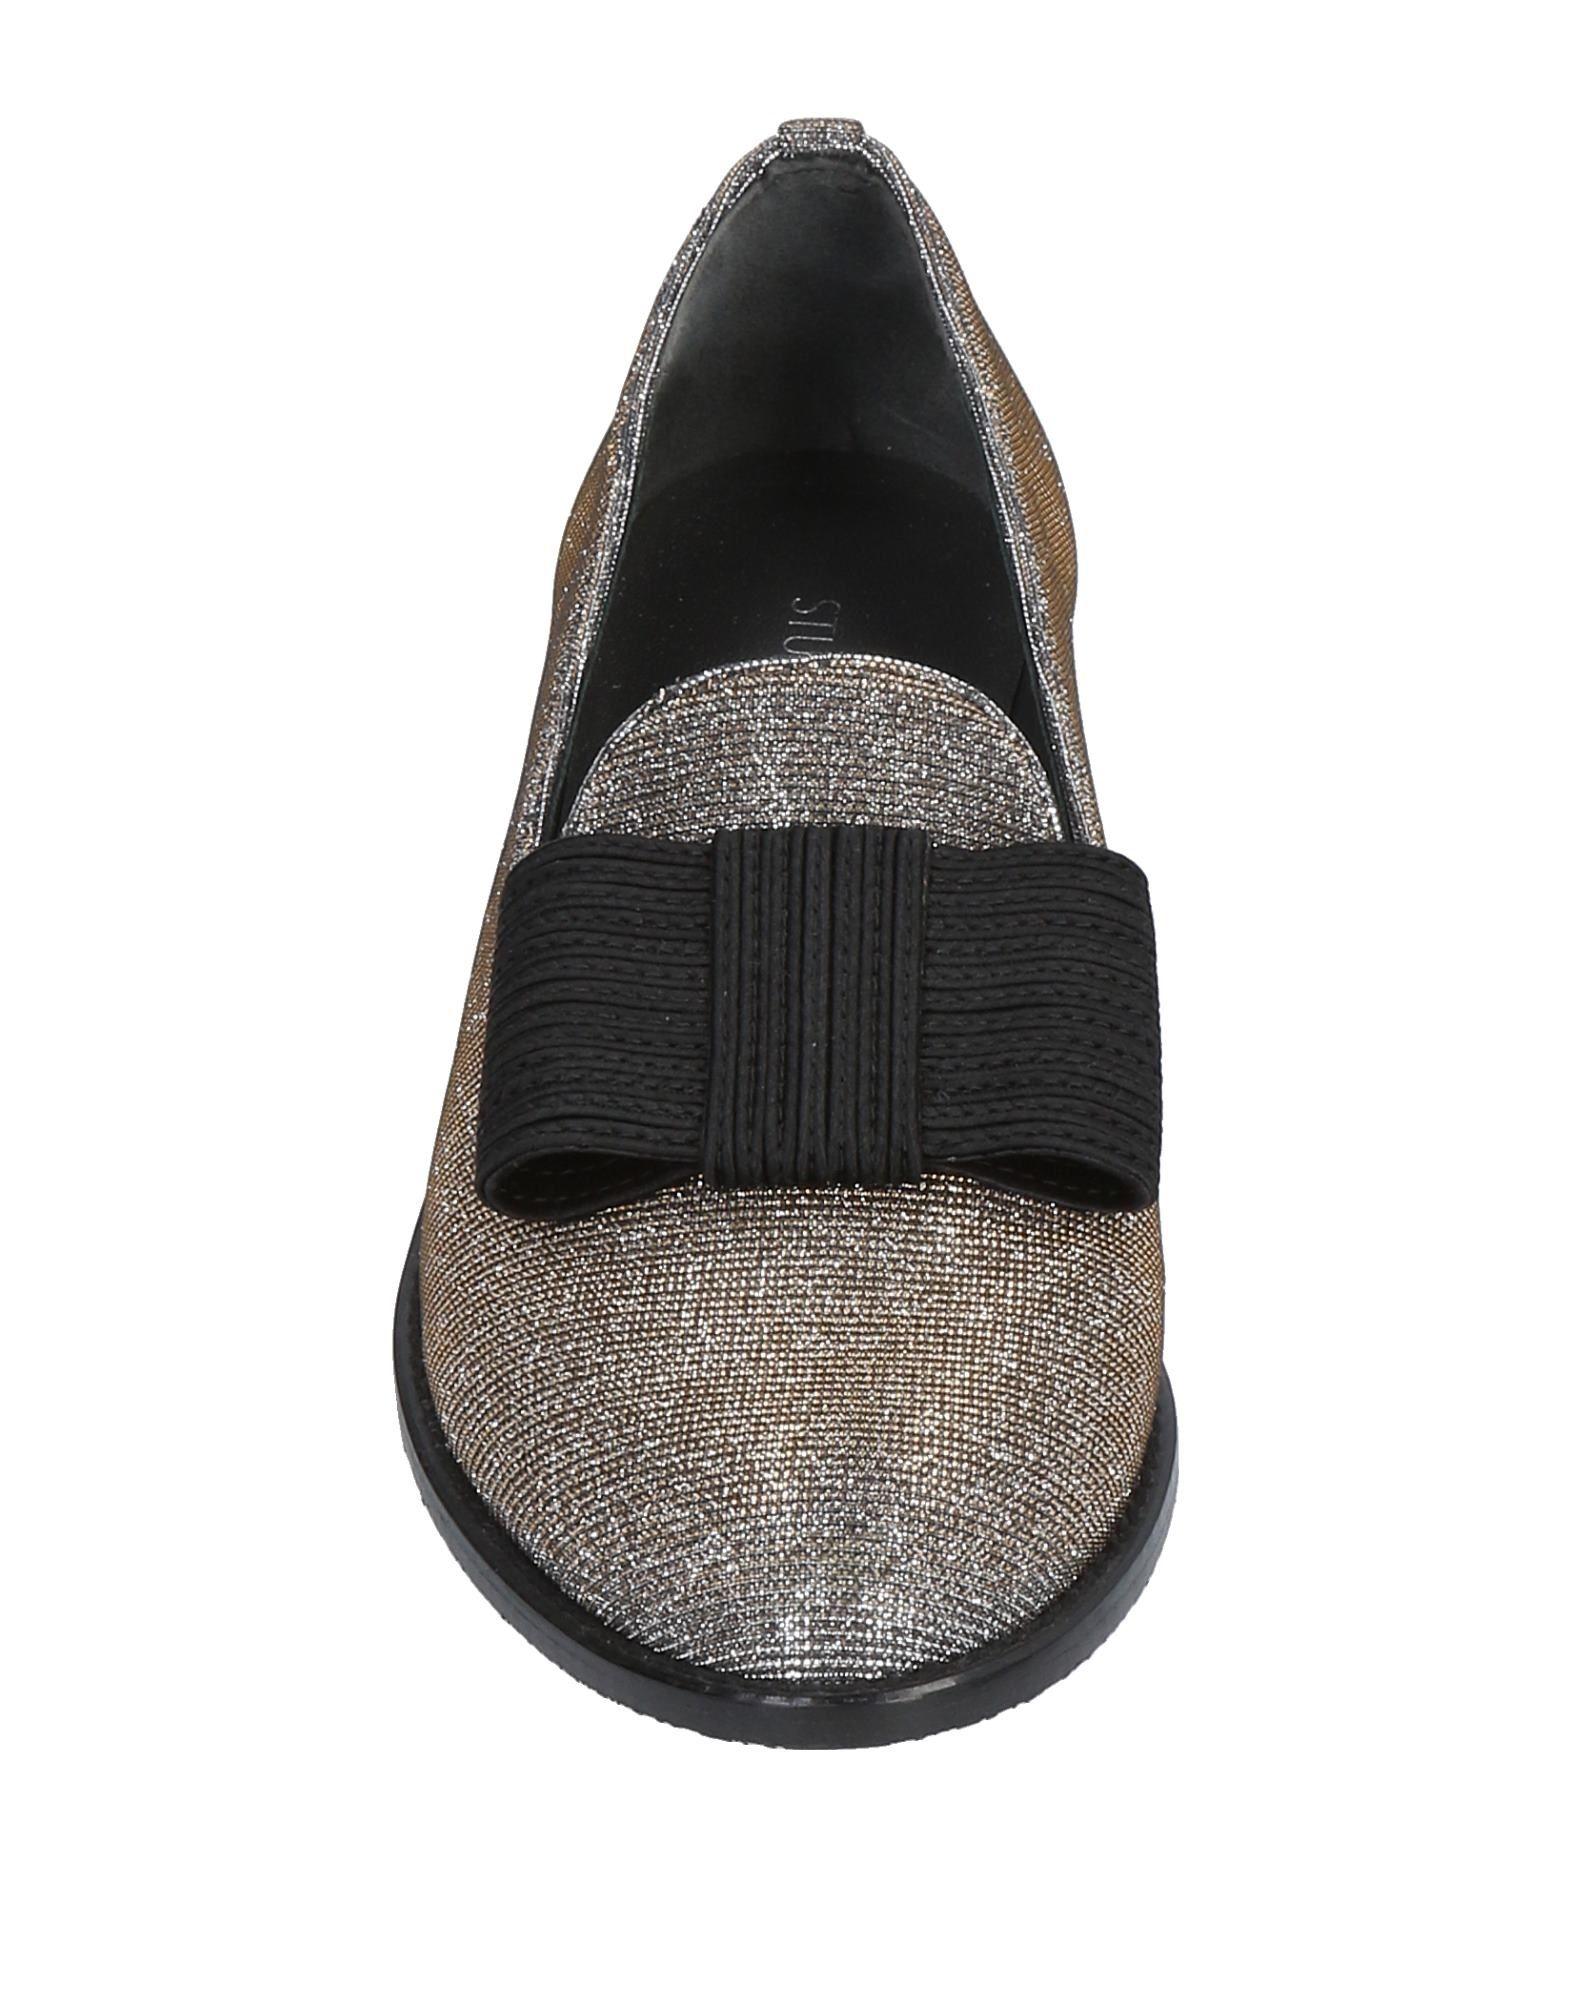 Stuart Weitzman Mokassins Damen  11475895AFGut aussehende strapazierfähige Schuhe